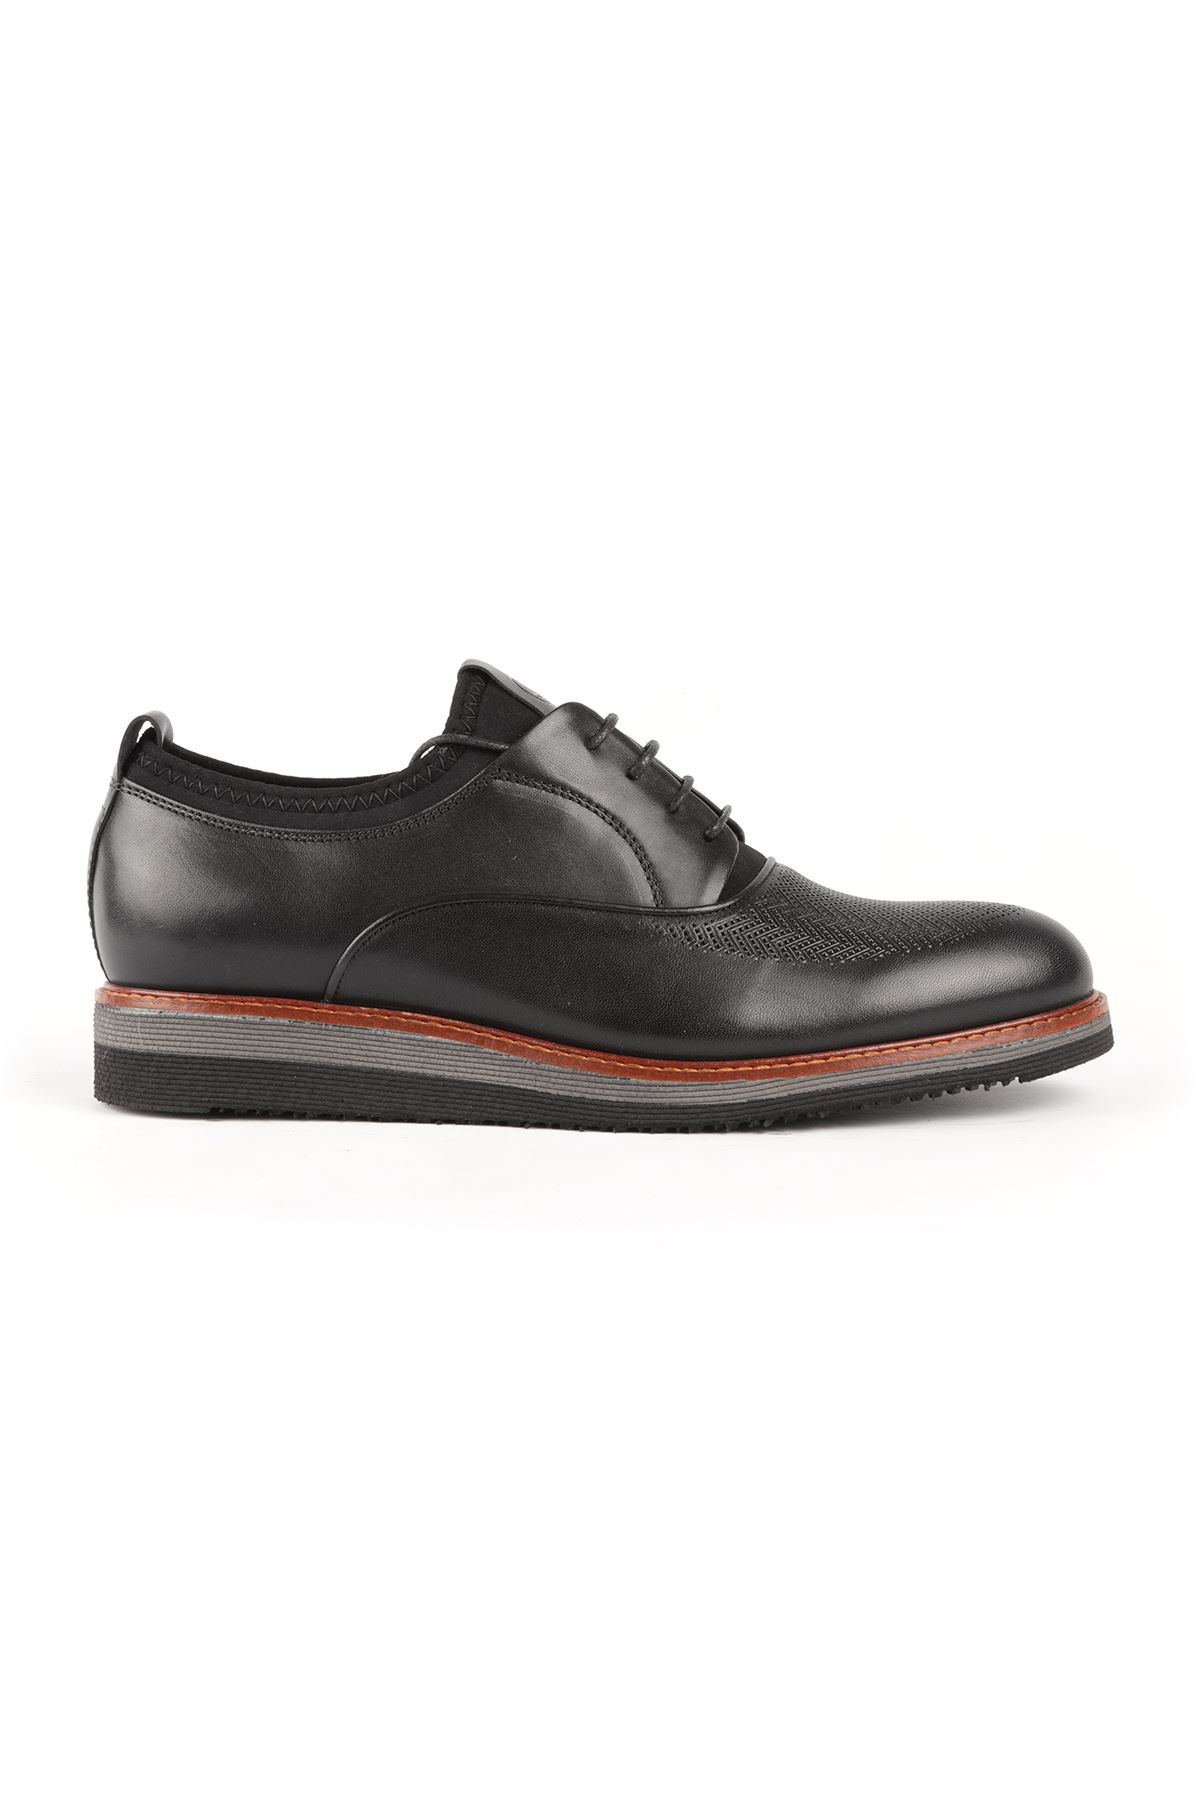 Libero L3577 Siyah Günlük Casual Ayakkabı